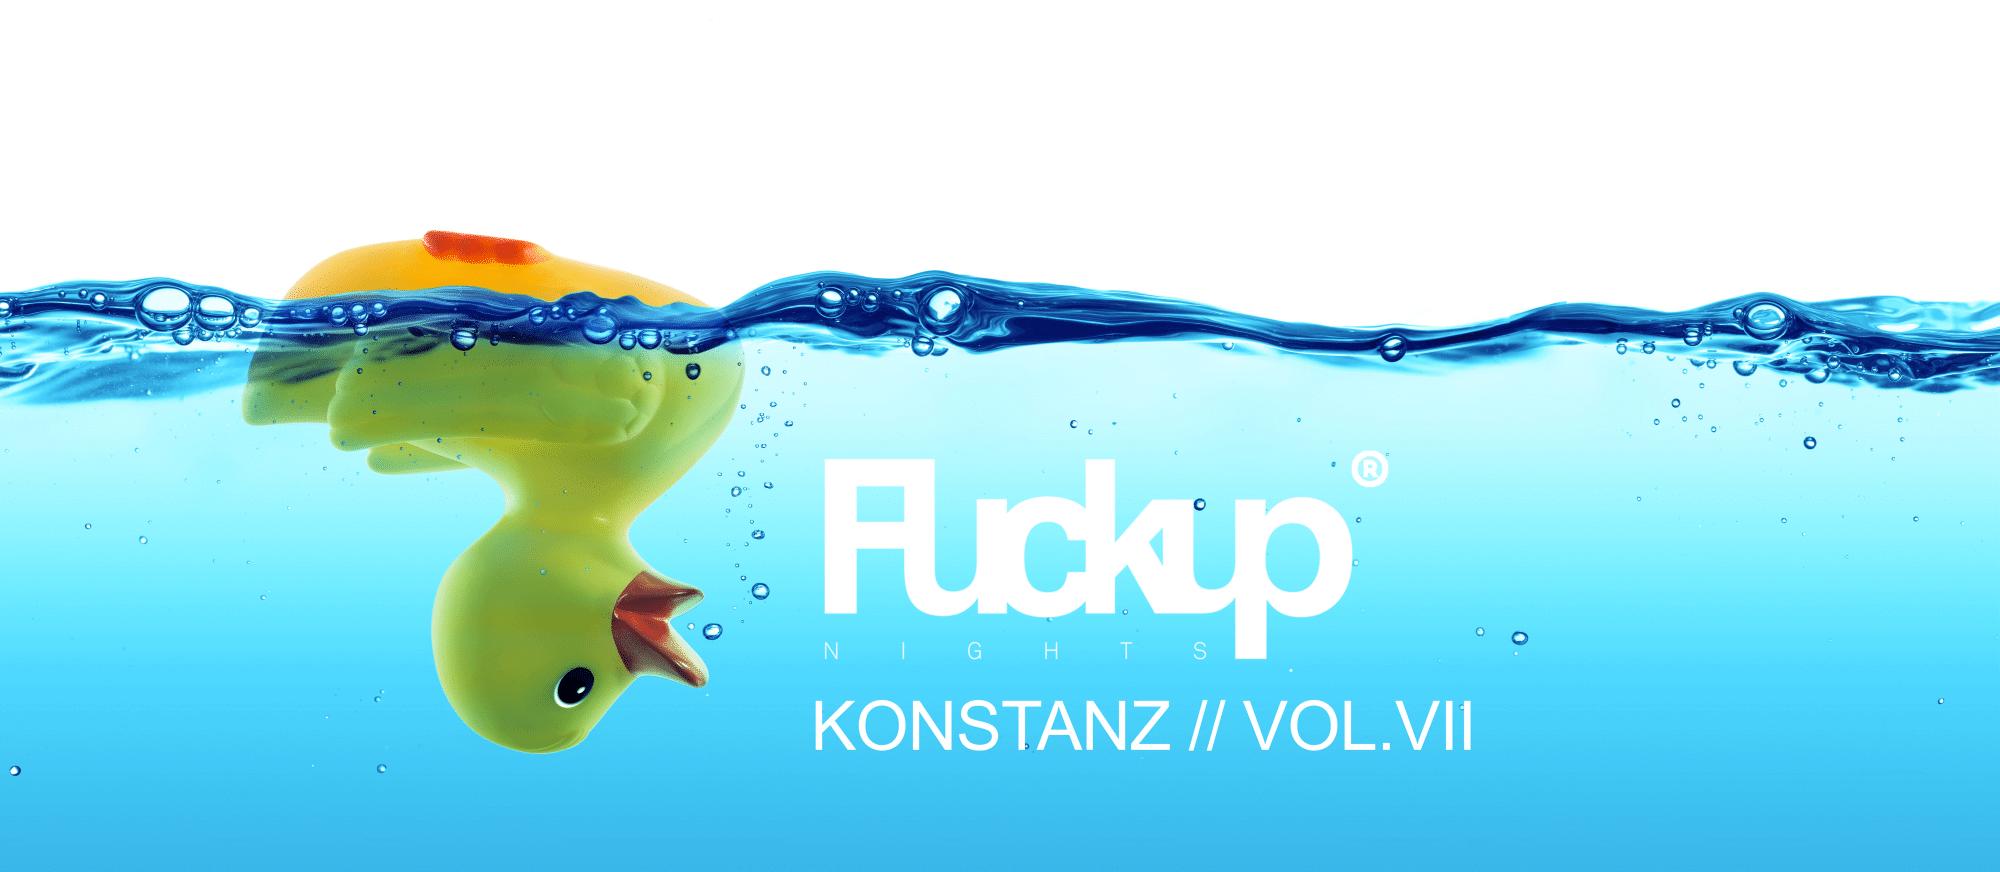 Veranstaltung Fuckup night Konstanz